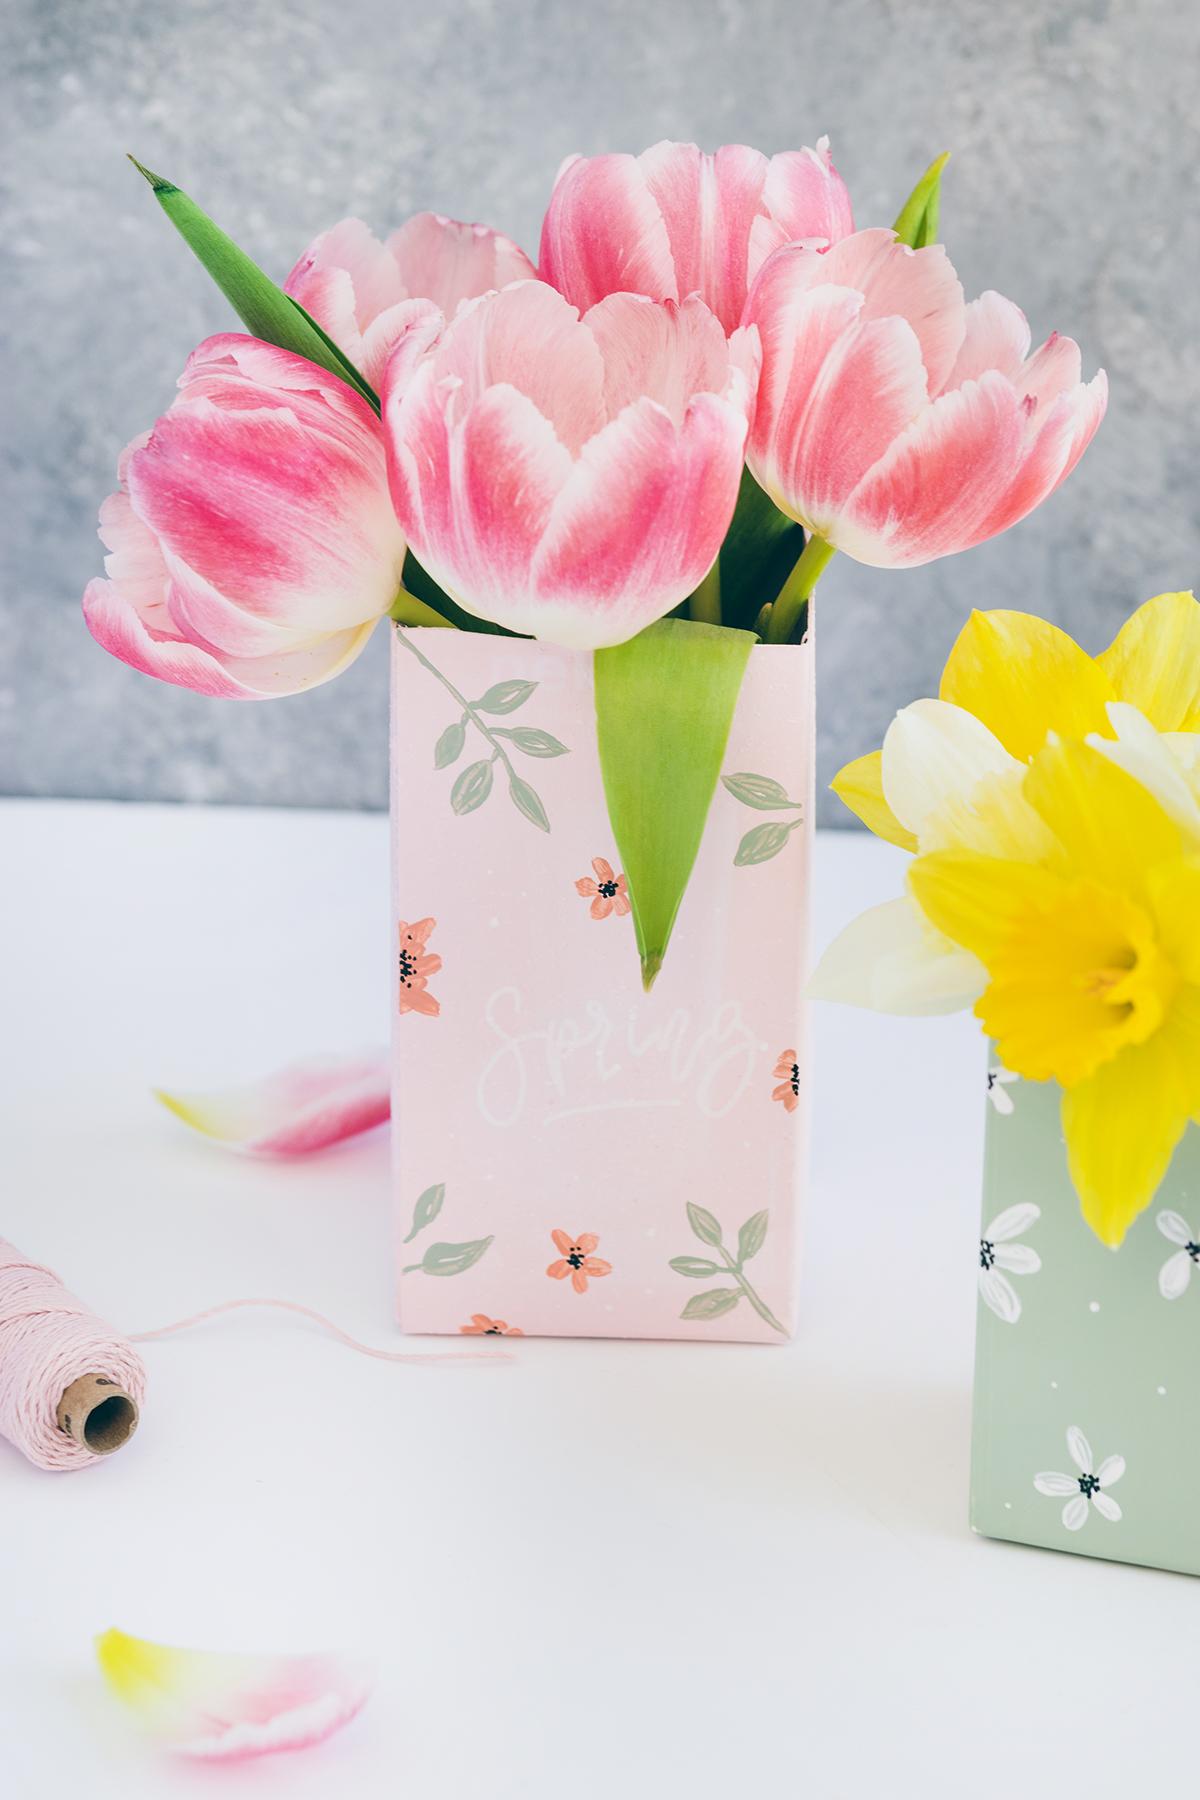 Tetrapack Upcycling Vasen